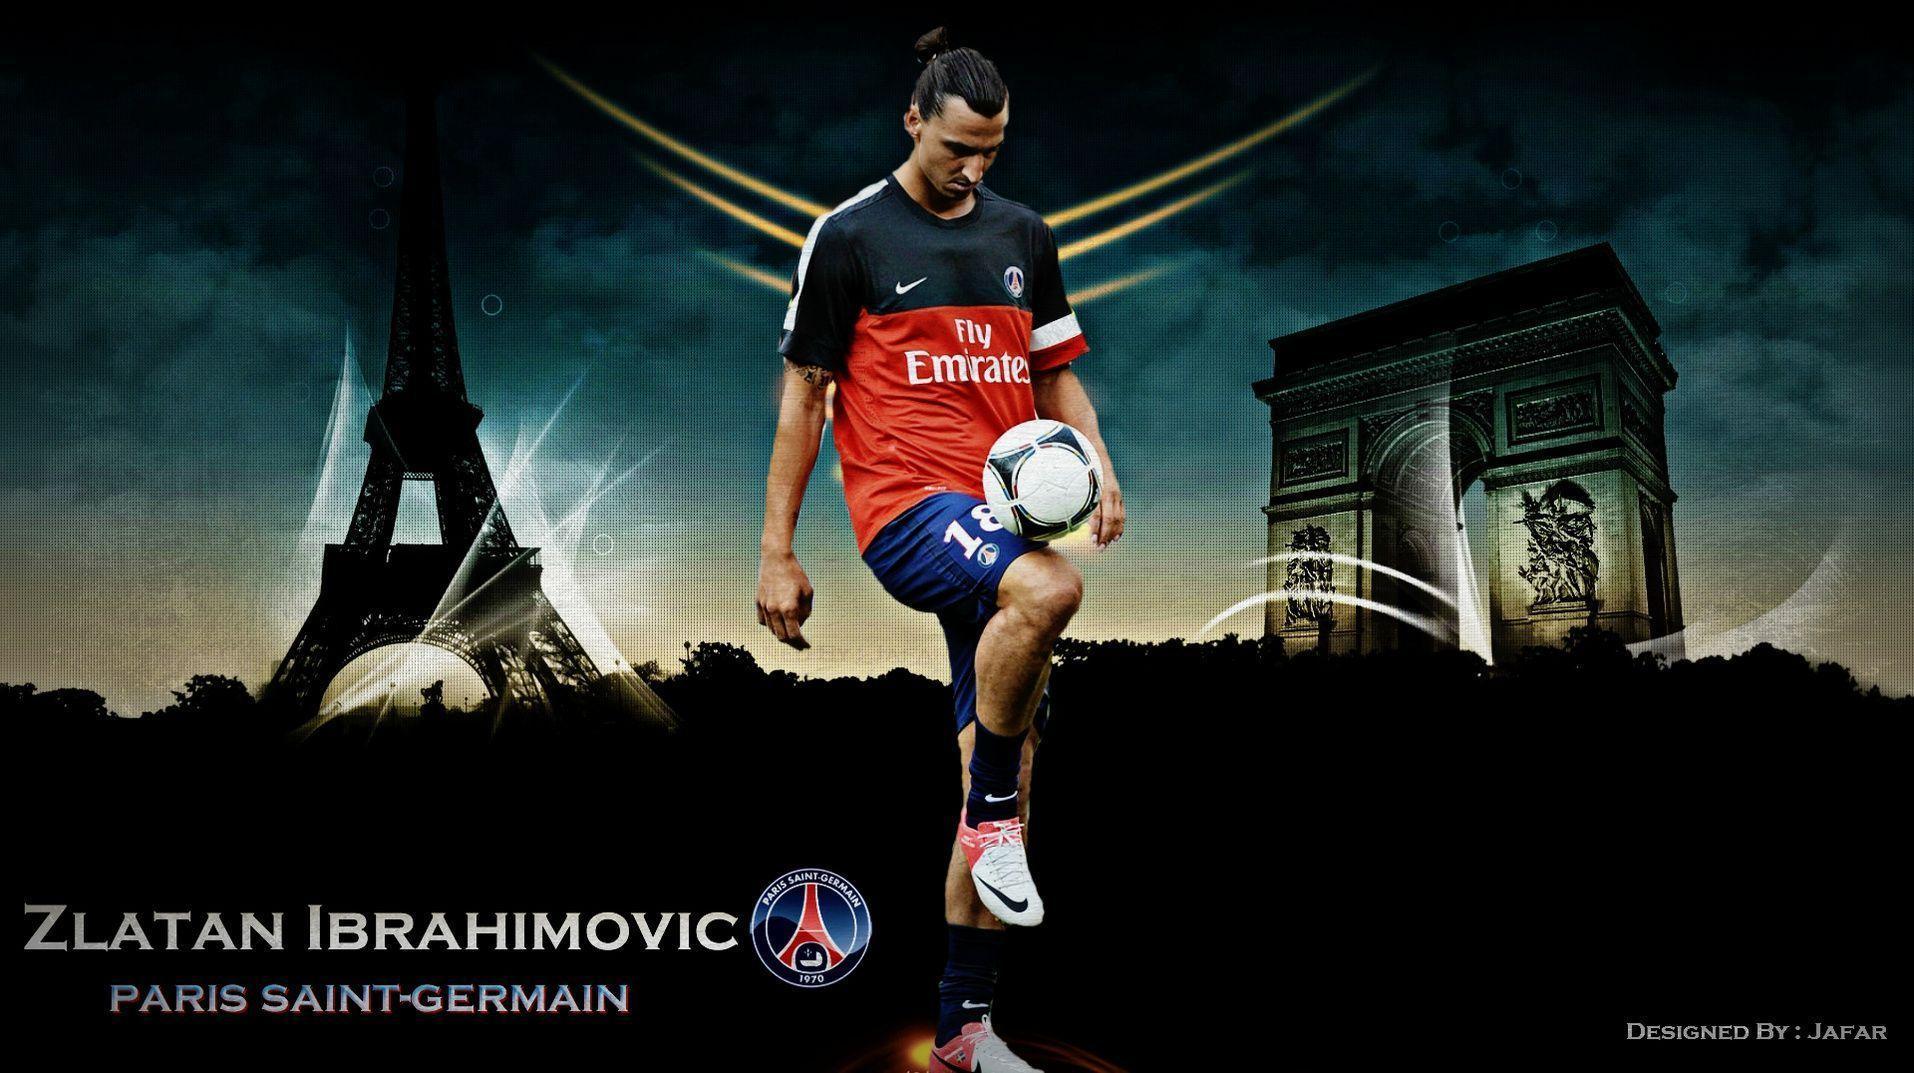 Zlatan Ibrahimovic PSG - Football Wallpaper HD, Football Picture ...